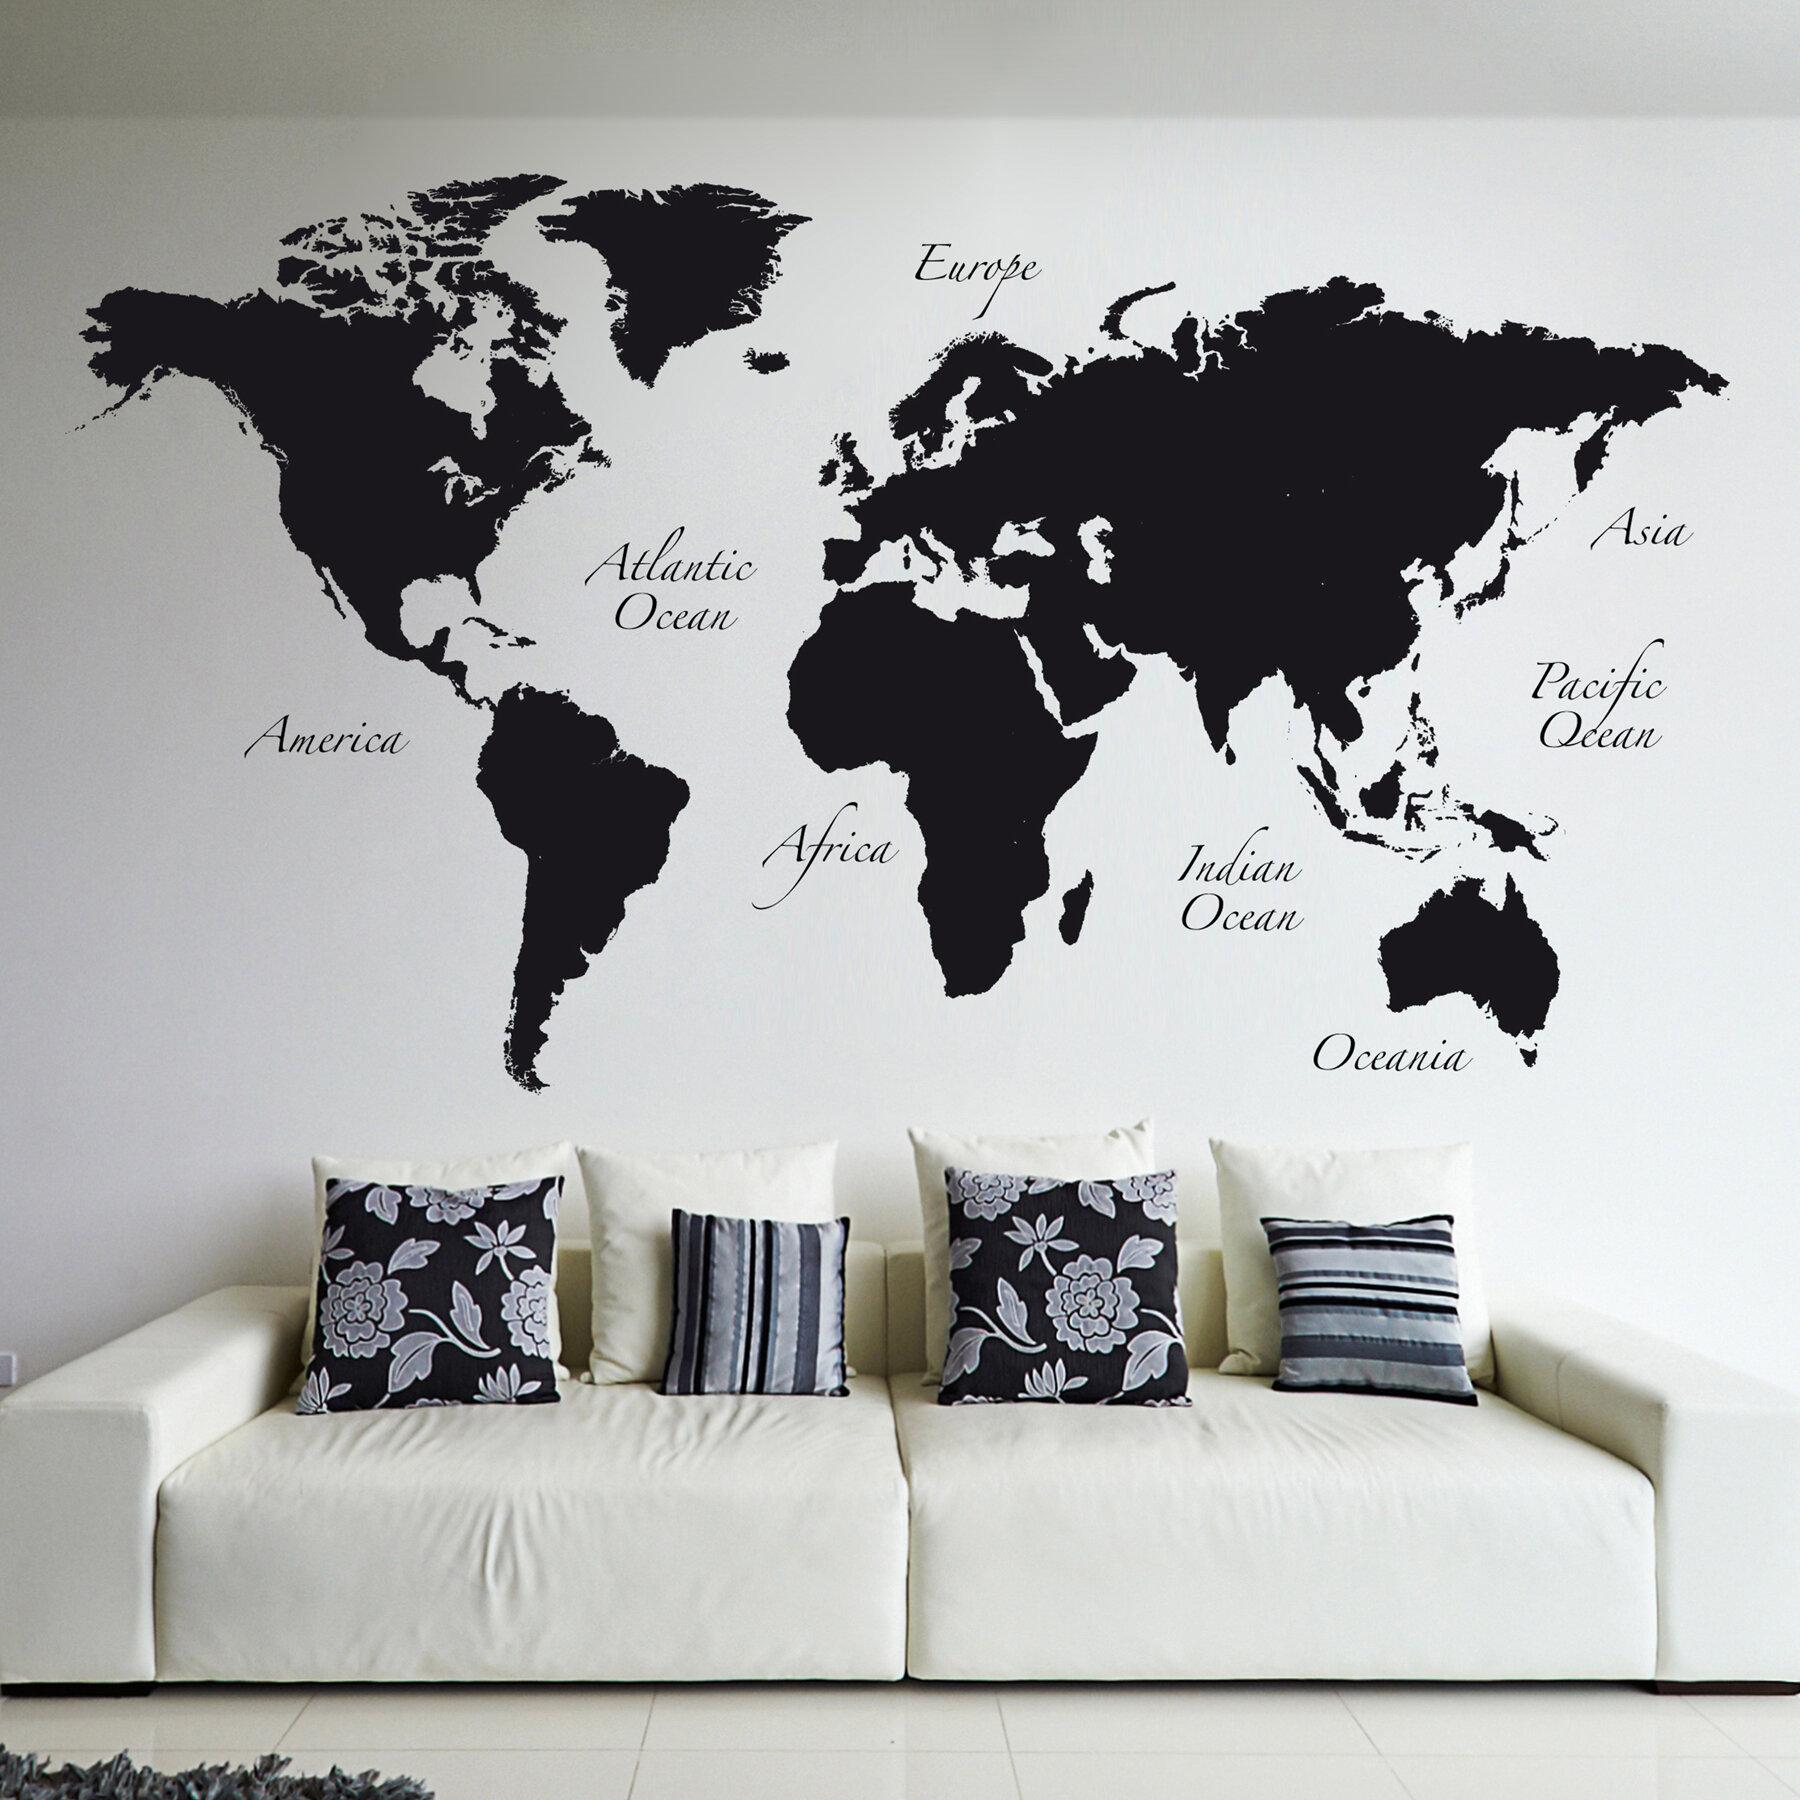 Map Wall Decal WallPops! World Map Wall Decal & Reviews | Wayfair